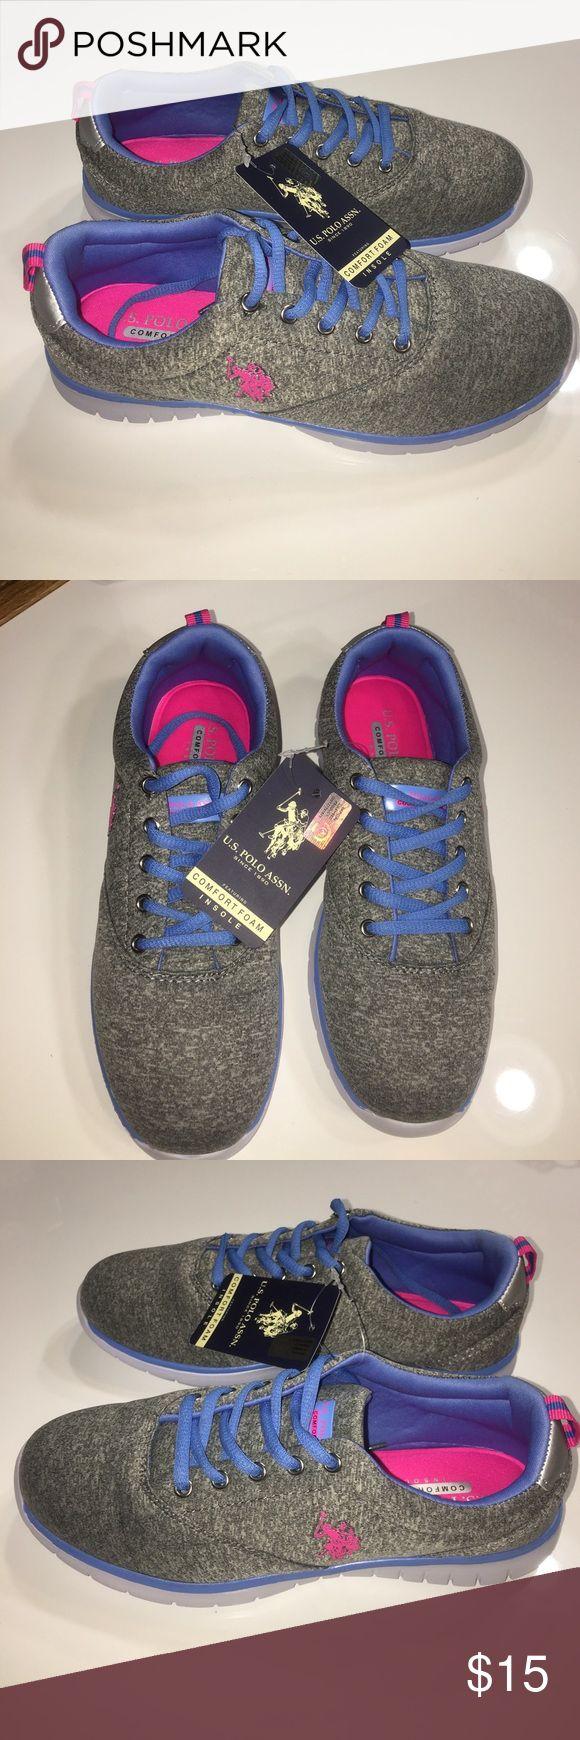 New U.S. Polo Assn. memory foam sneakers  sz 7.5 New U.S. Polo Assn.. memory foam sneakers tennis shoes sz 7.5 final sale price listed please no offers U.S. Polo Assn. Shoes Sneakers